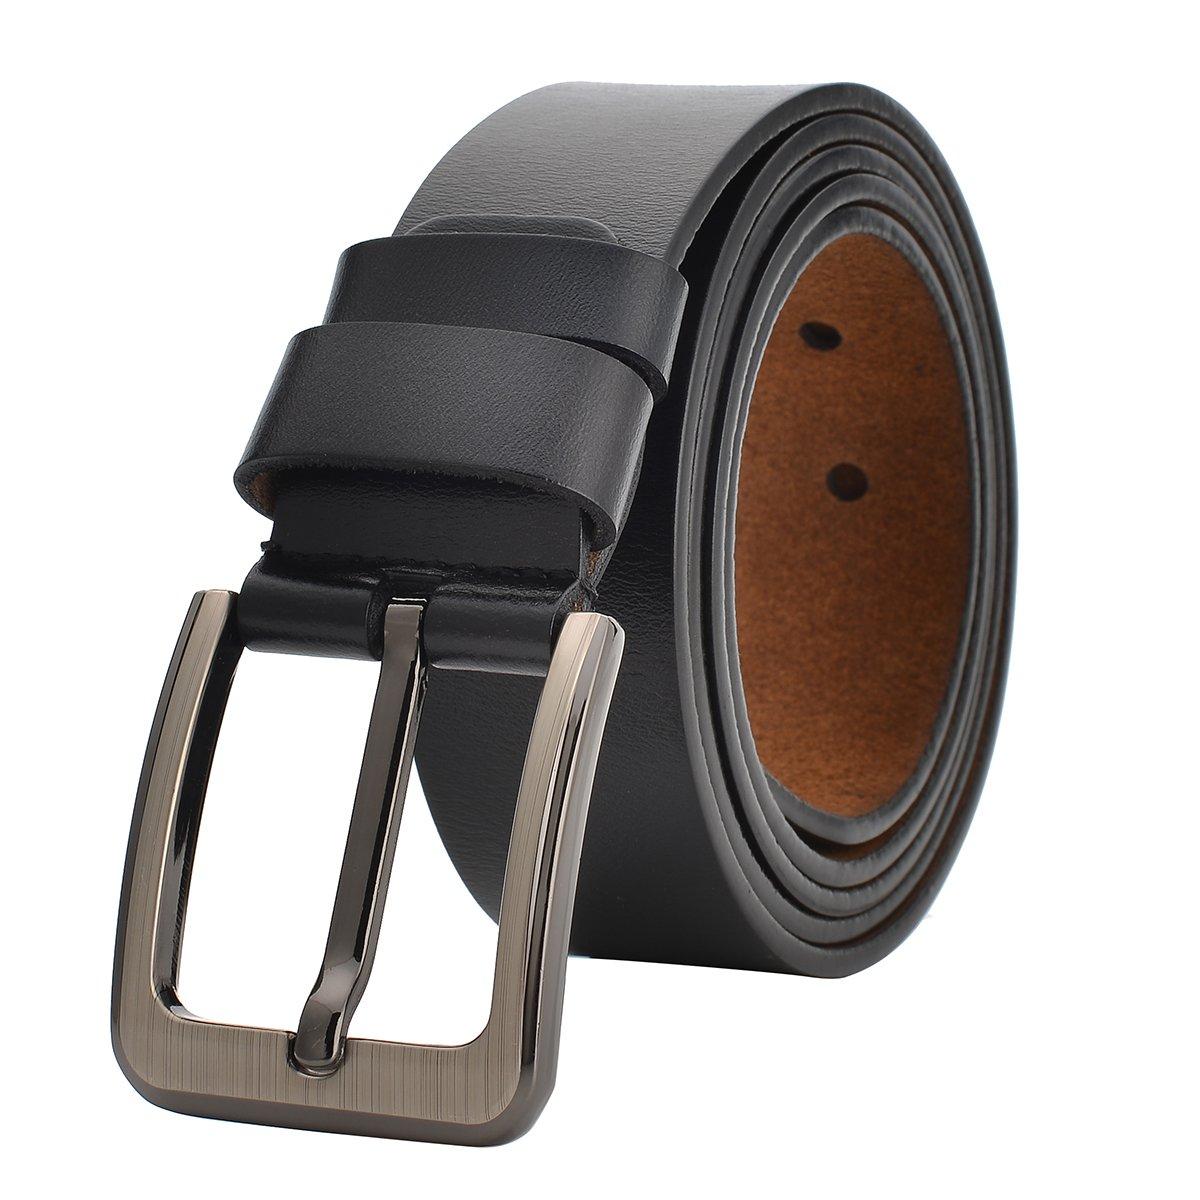 "35""-62"" Waist Men Dress Belt Genuine Leather Jeans Casual for Regular & Big and Tall (37""-39"" Waist, Black)"